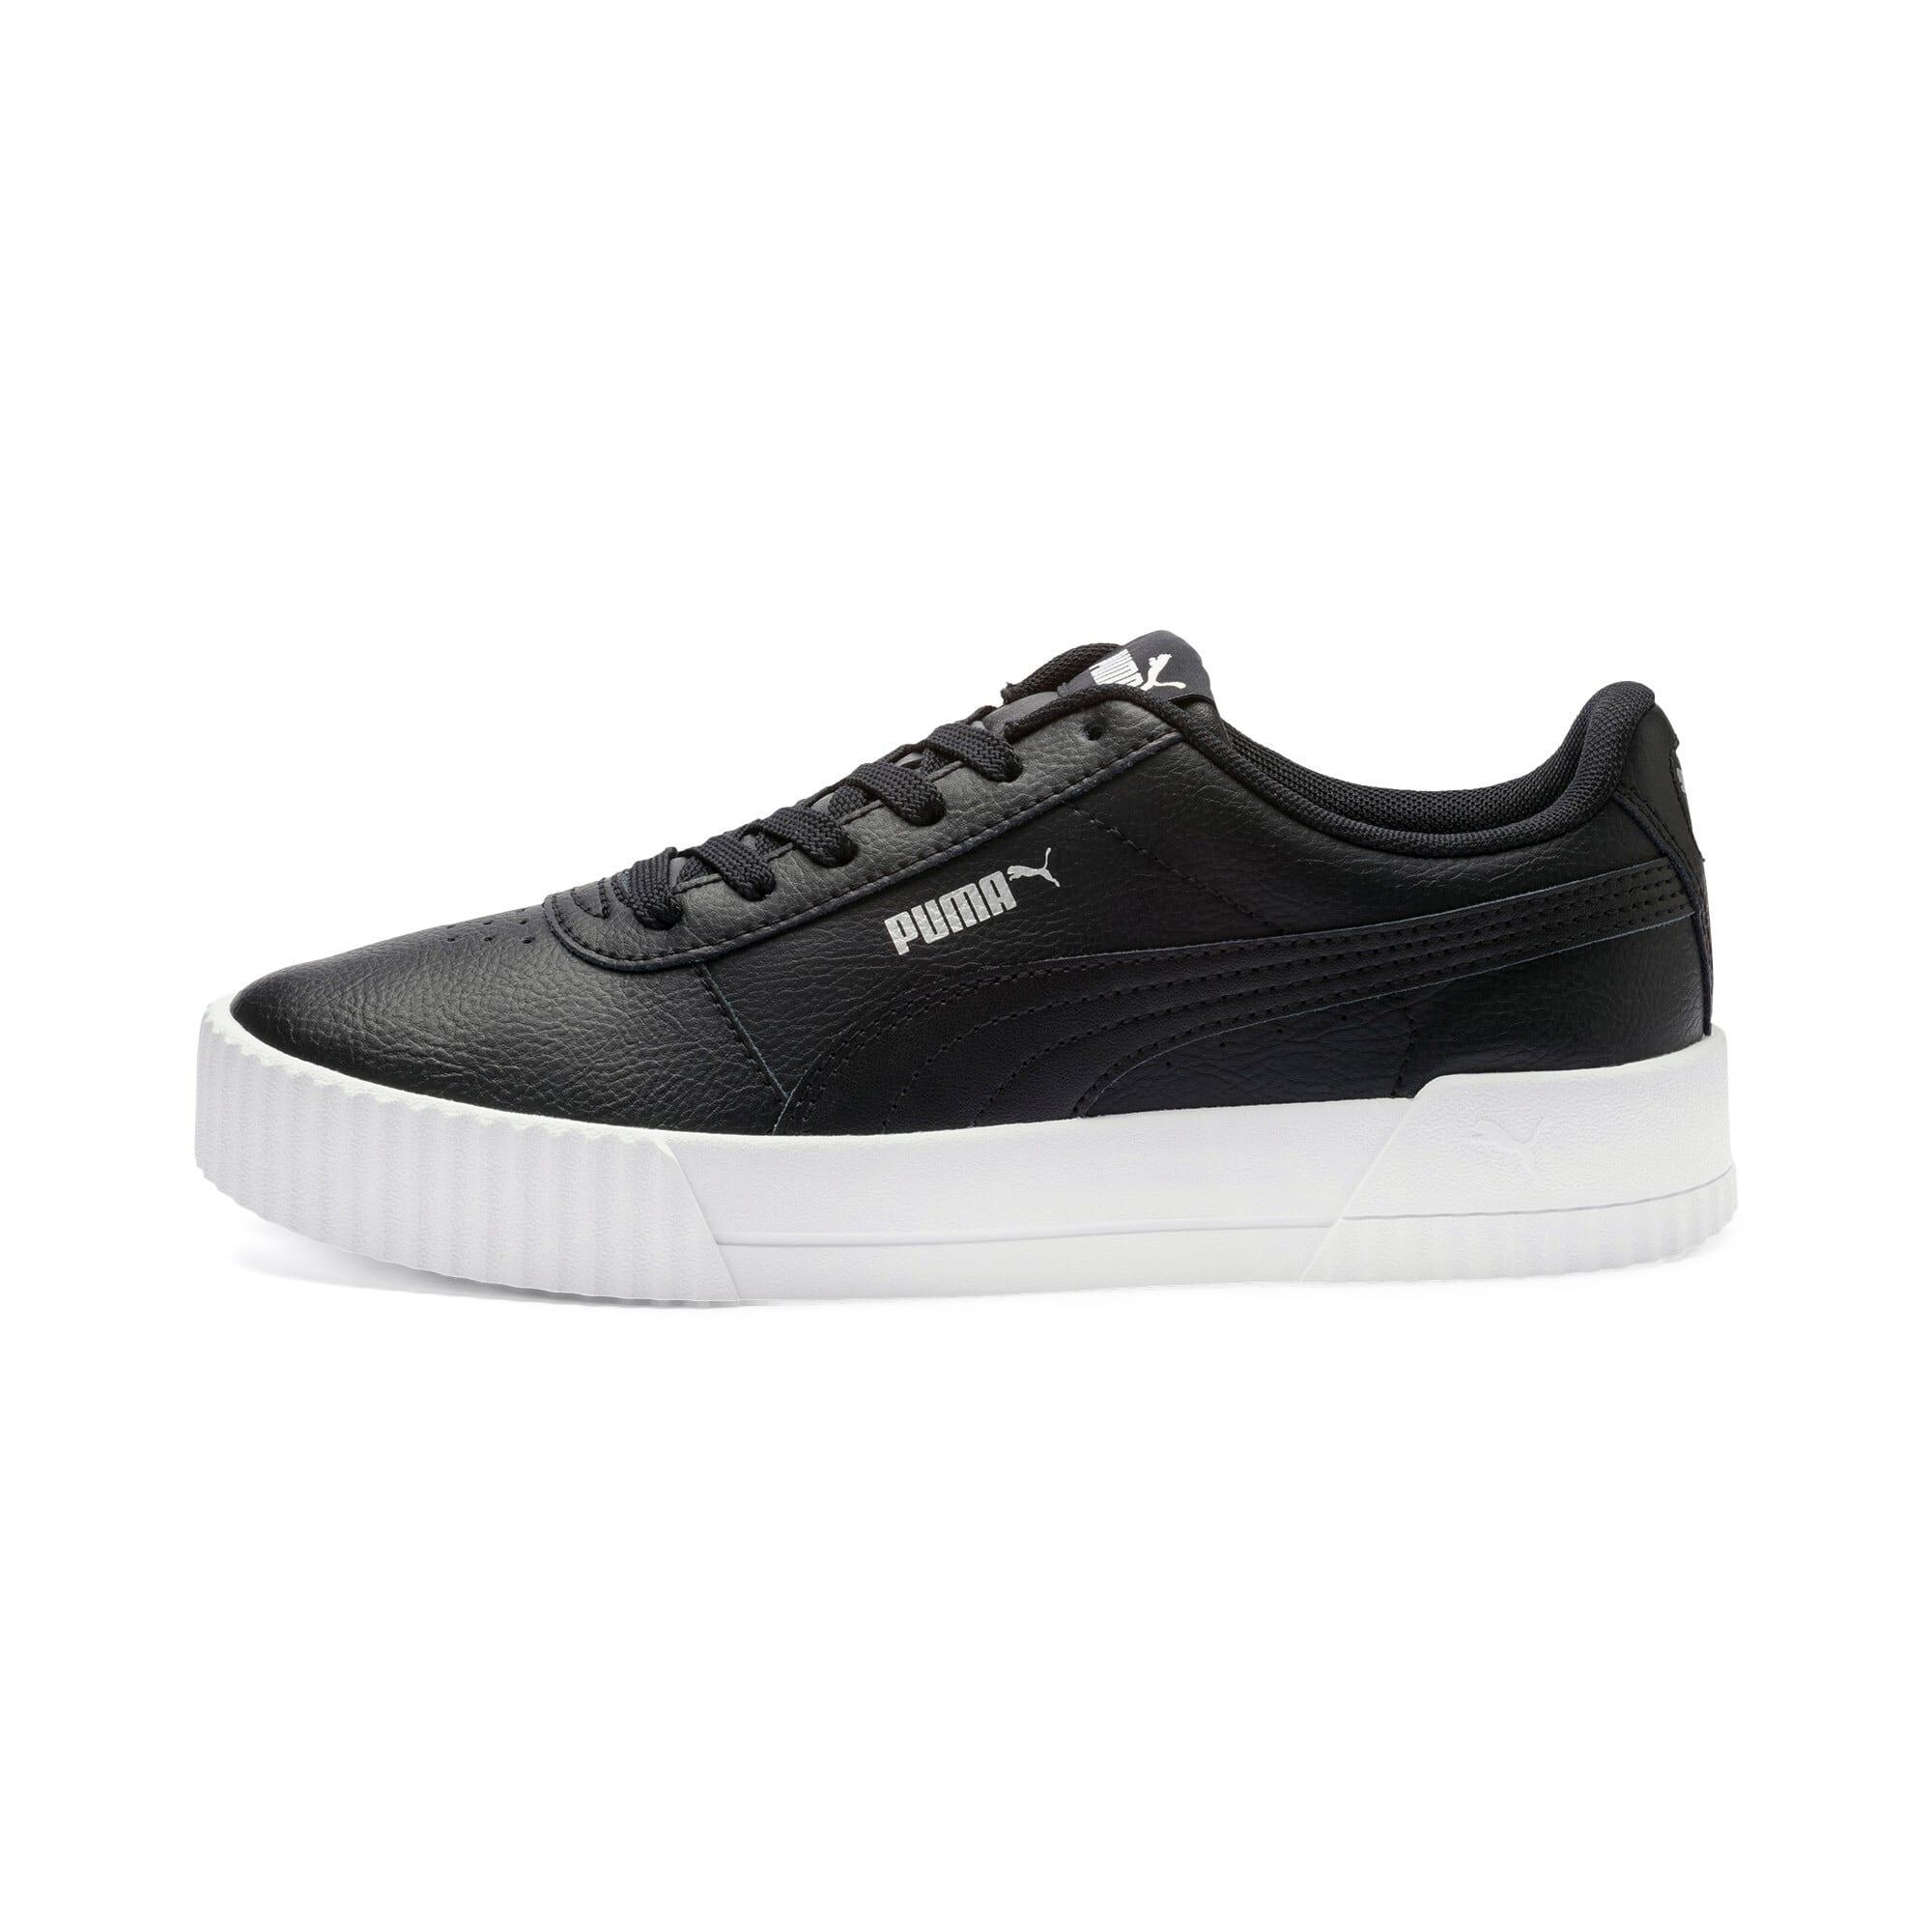 Thumbnail 1 of Carina Leather Women's Sneakers, Puma Black- White-Silver, medium